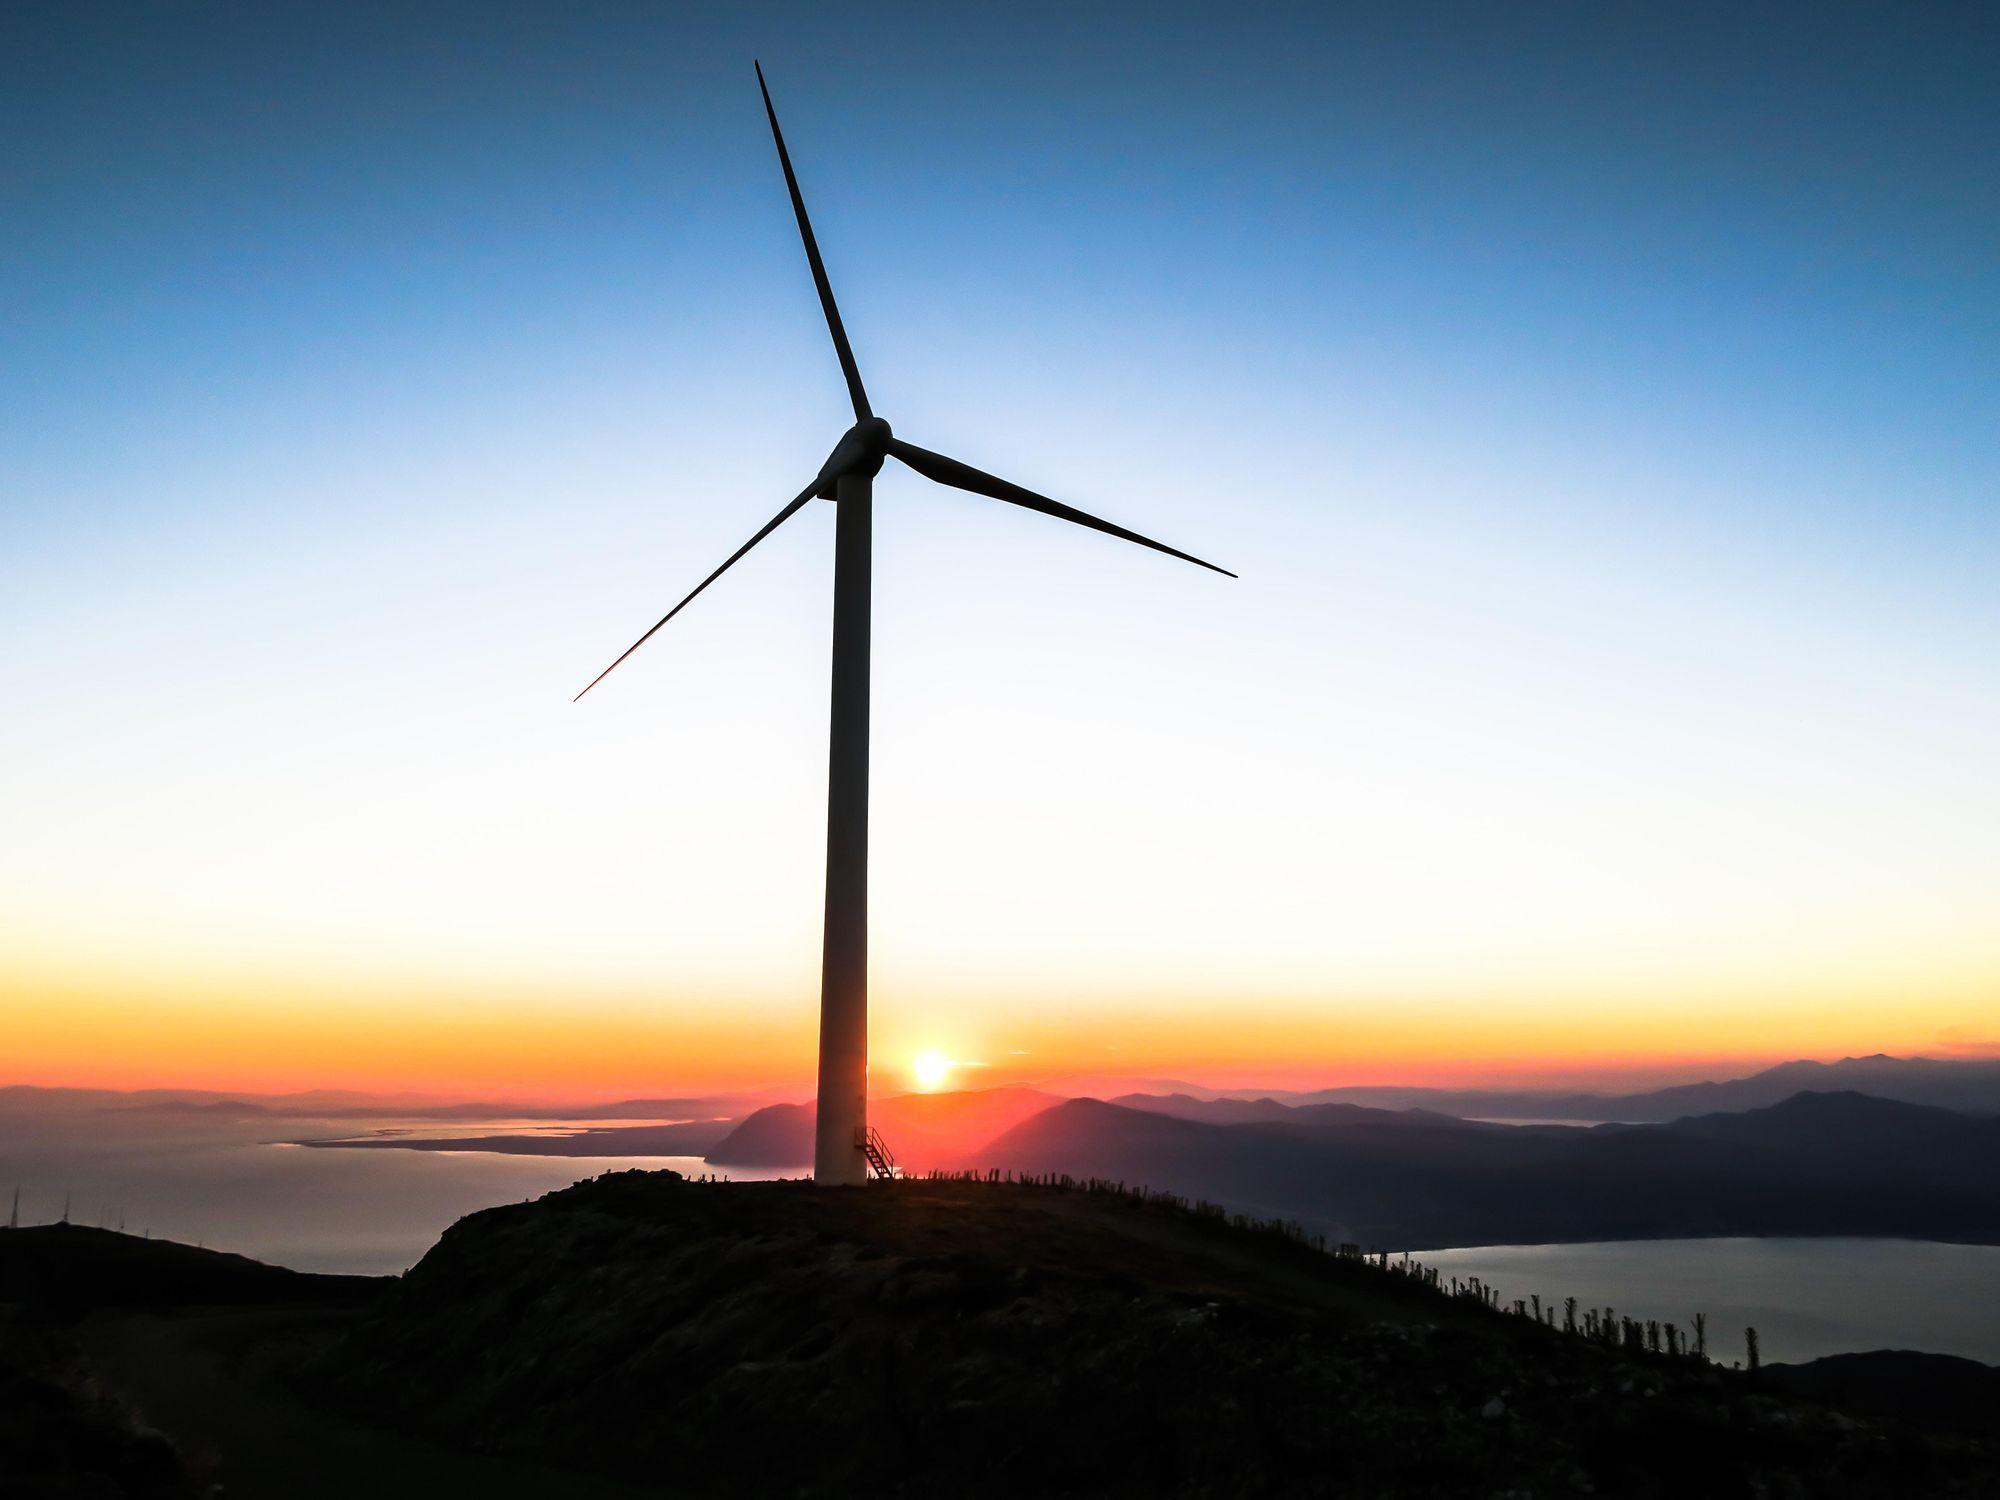 Shift to renewable energy eases key environmental burdens, EU says